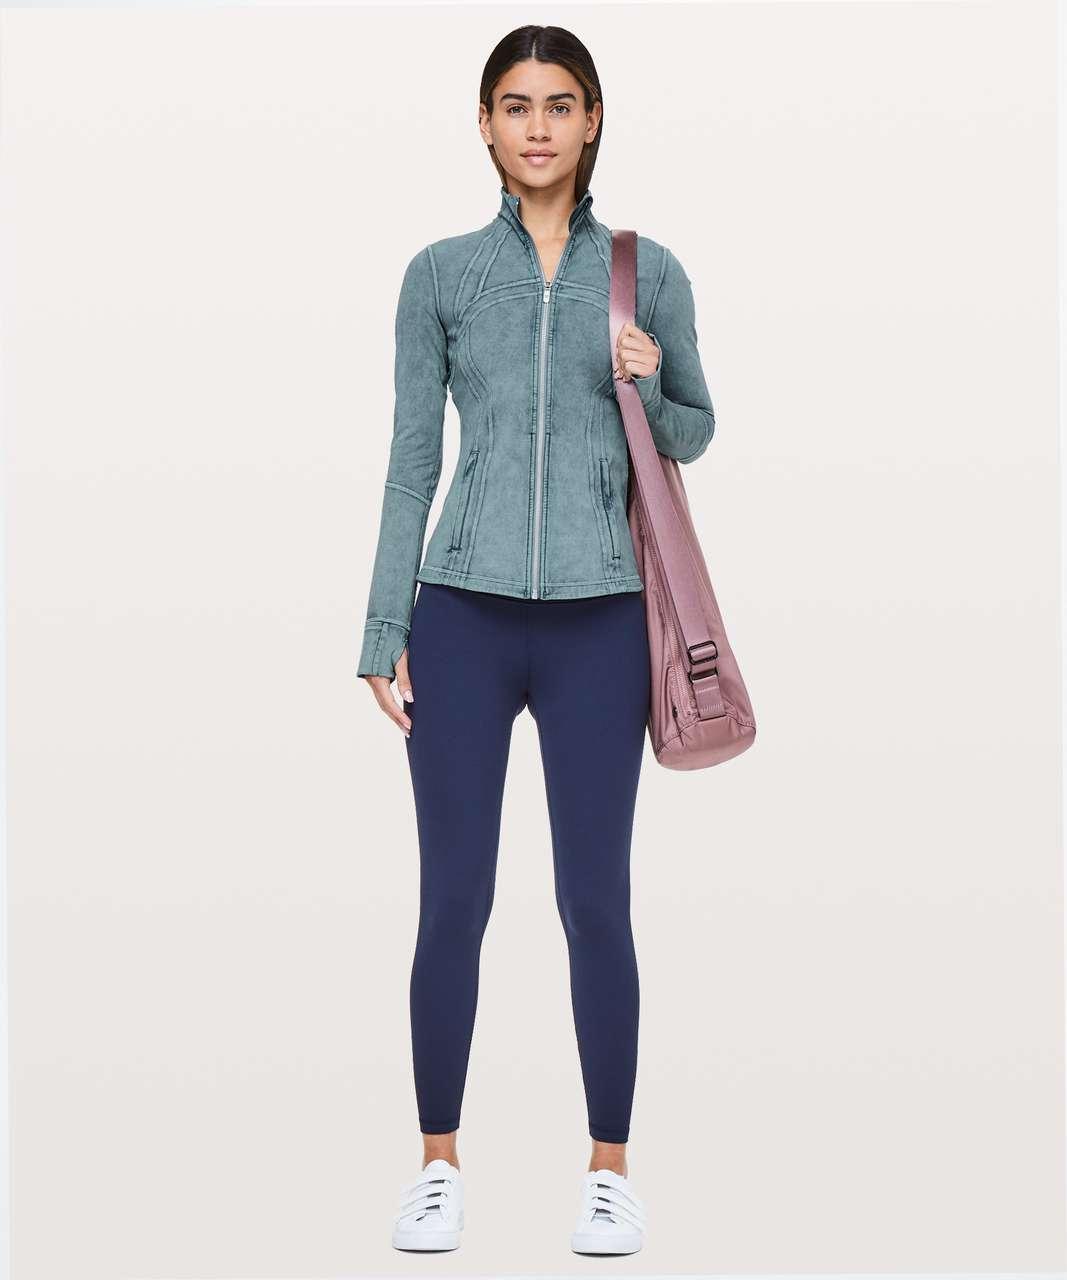 eccf511b08a Lululemon Define Jacket  Luxtreme - Washed Petrol Blue - lulu fanatics